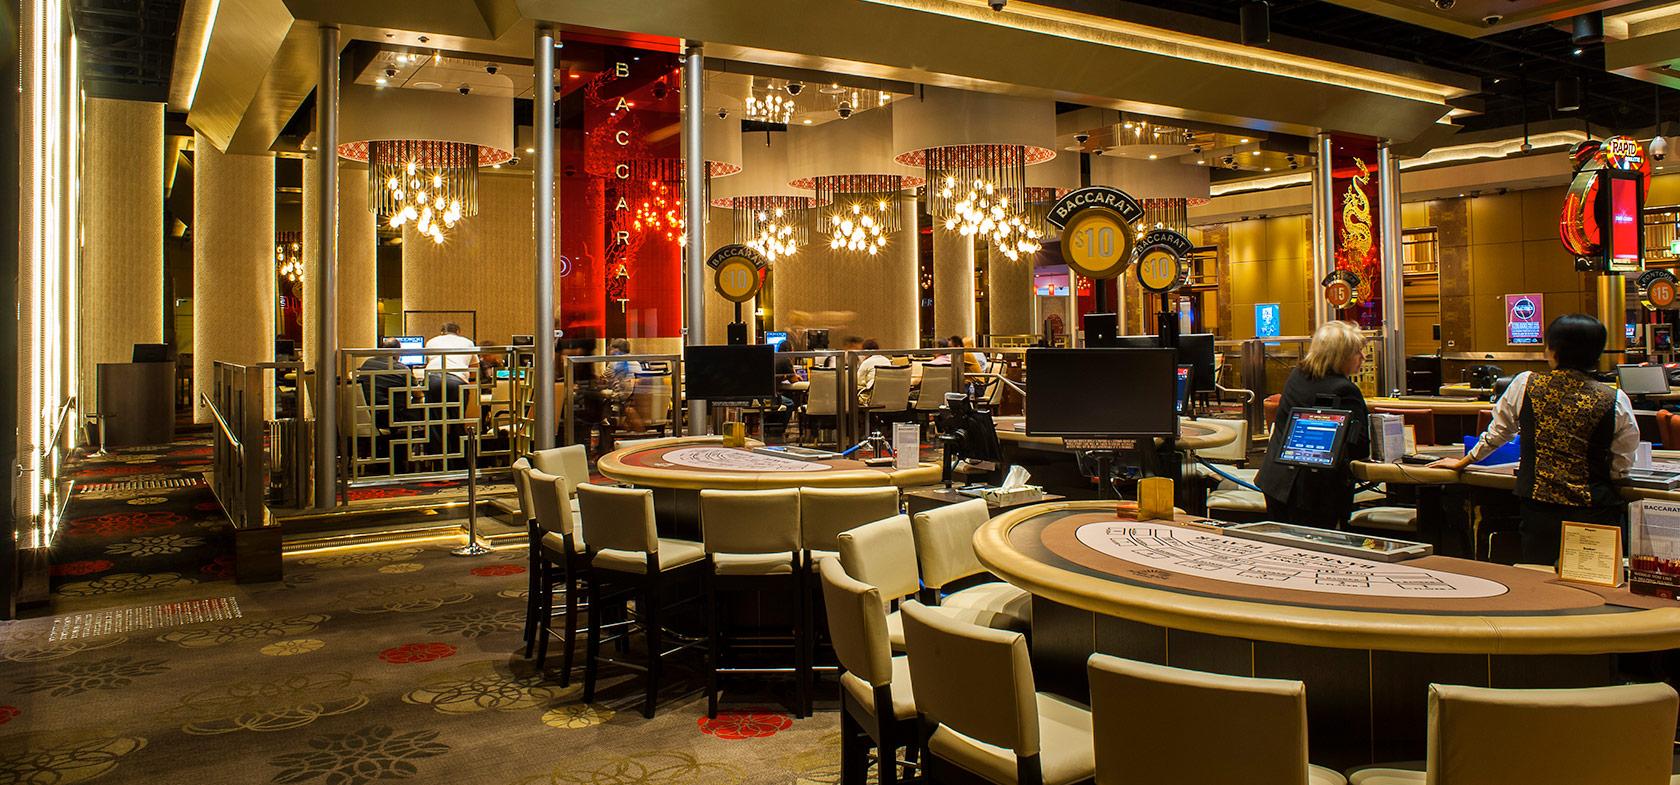 SKYCITY Adelaide Casino Baccarat Gaming Room